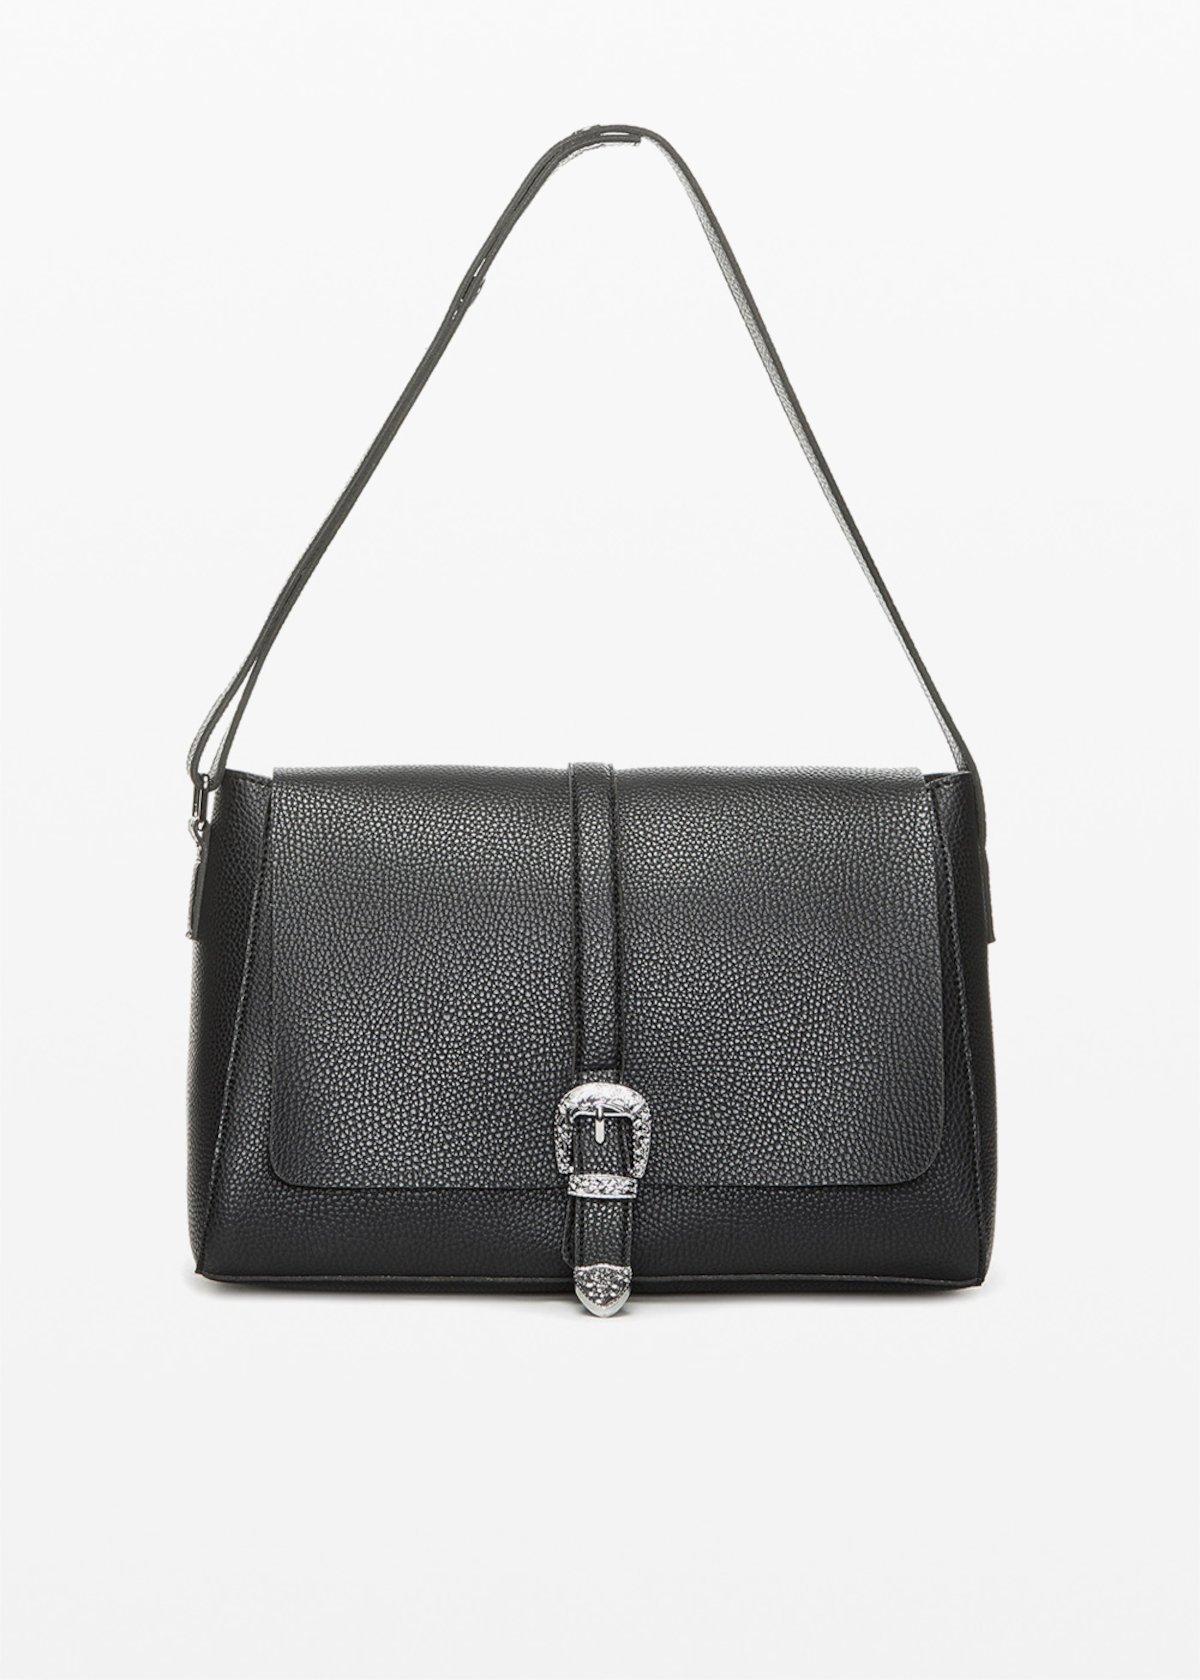 Boraliatx shopping bag with metal closure